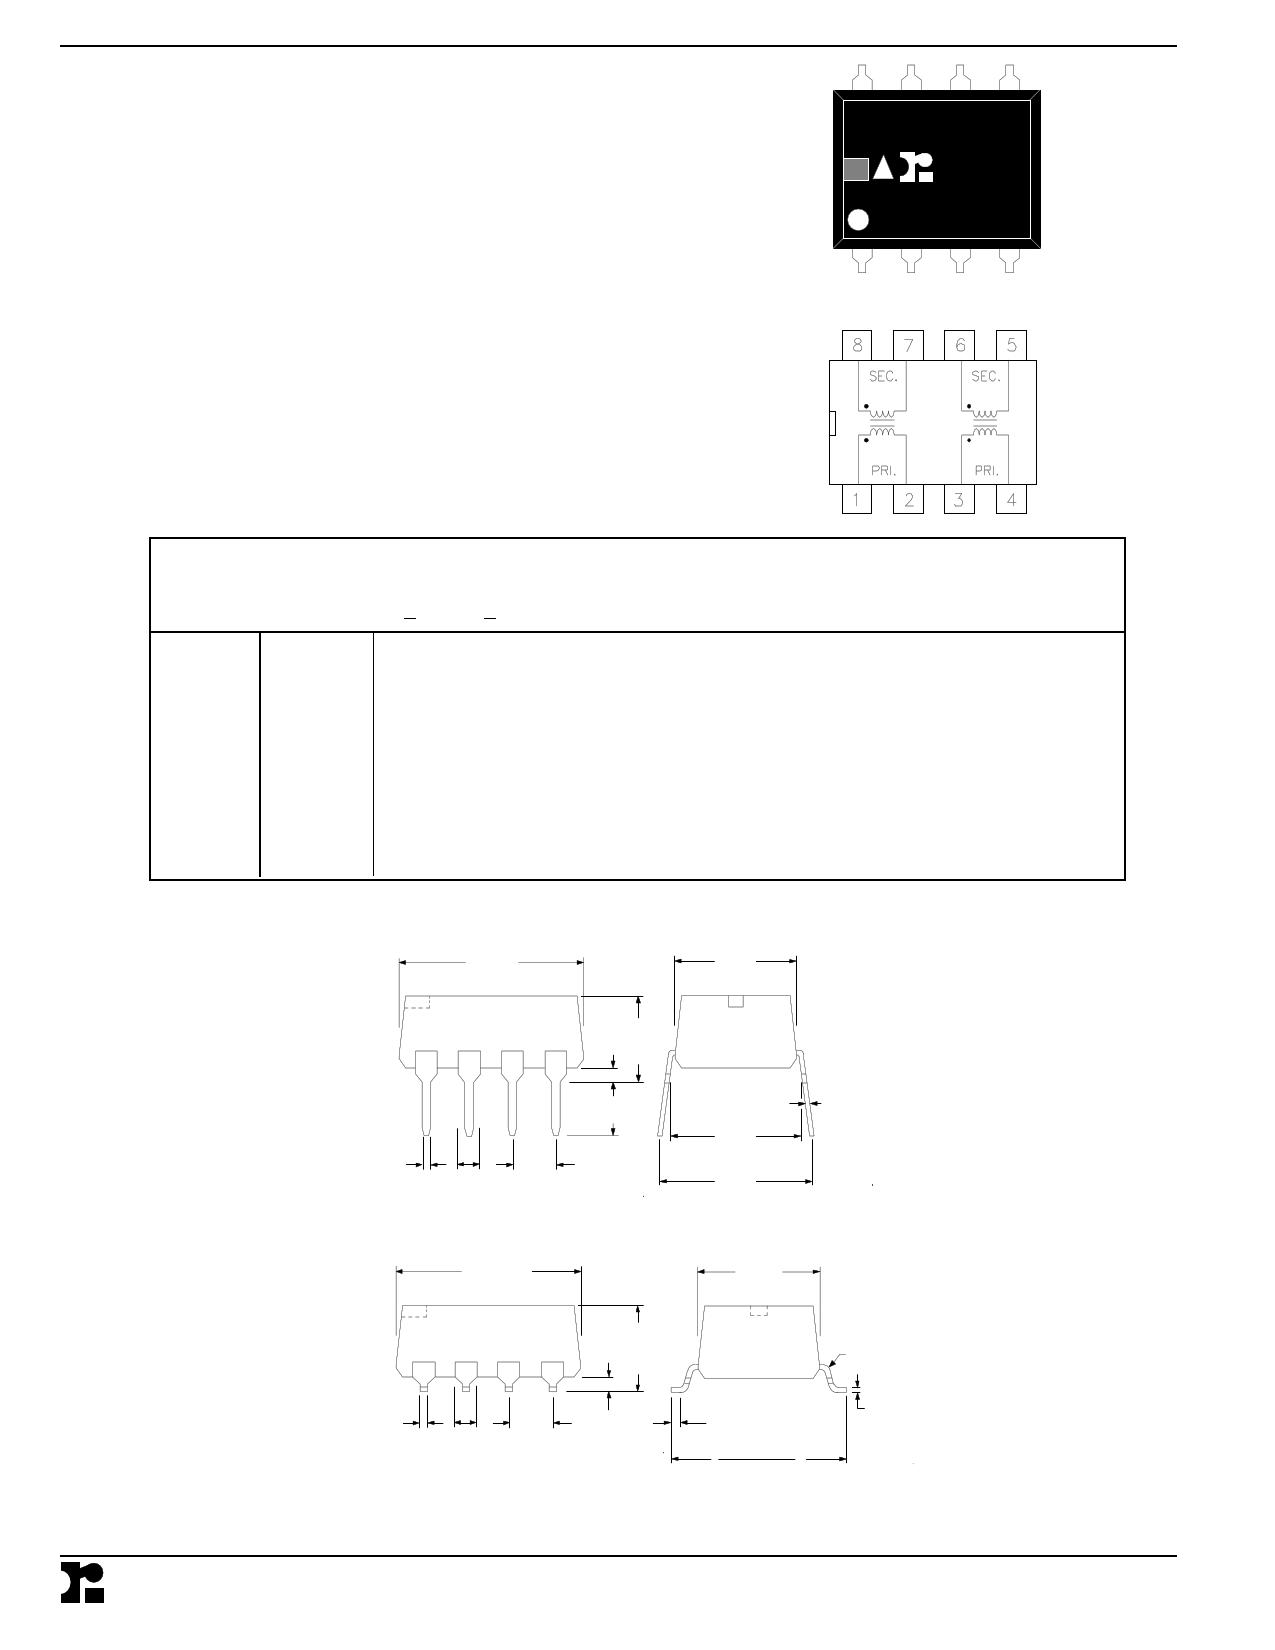 T-11302 datasheet